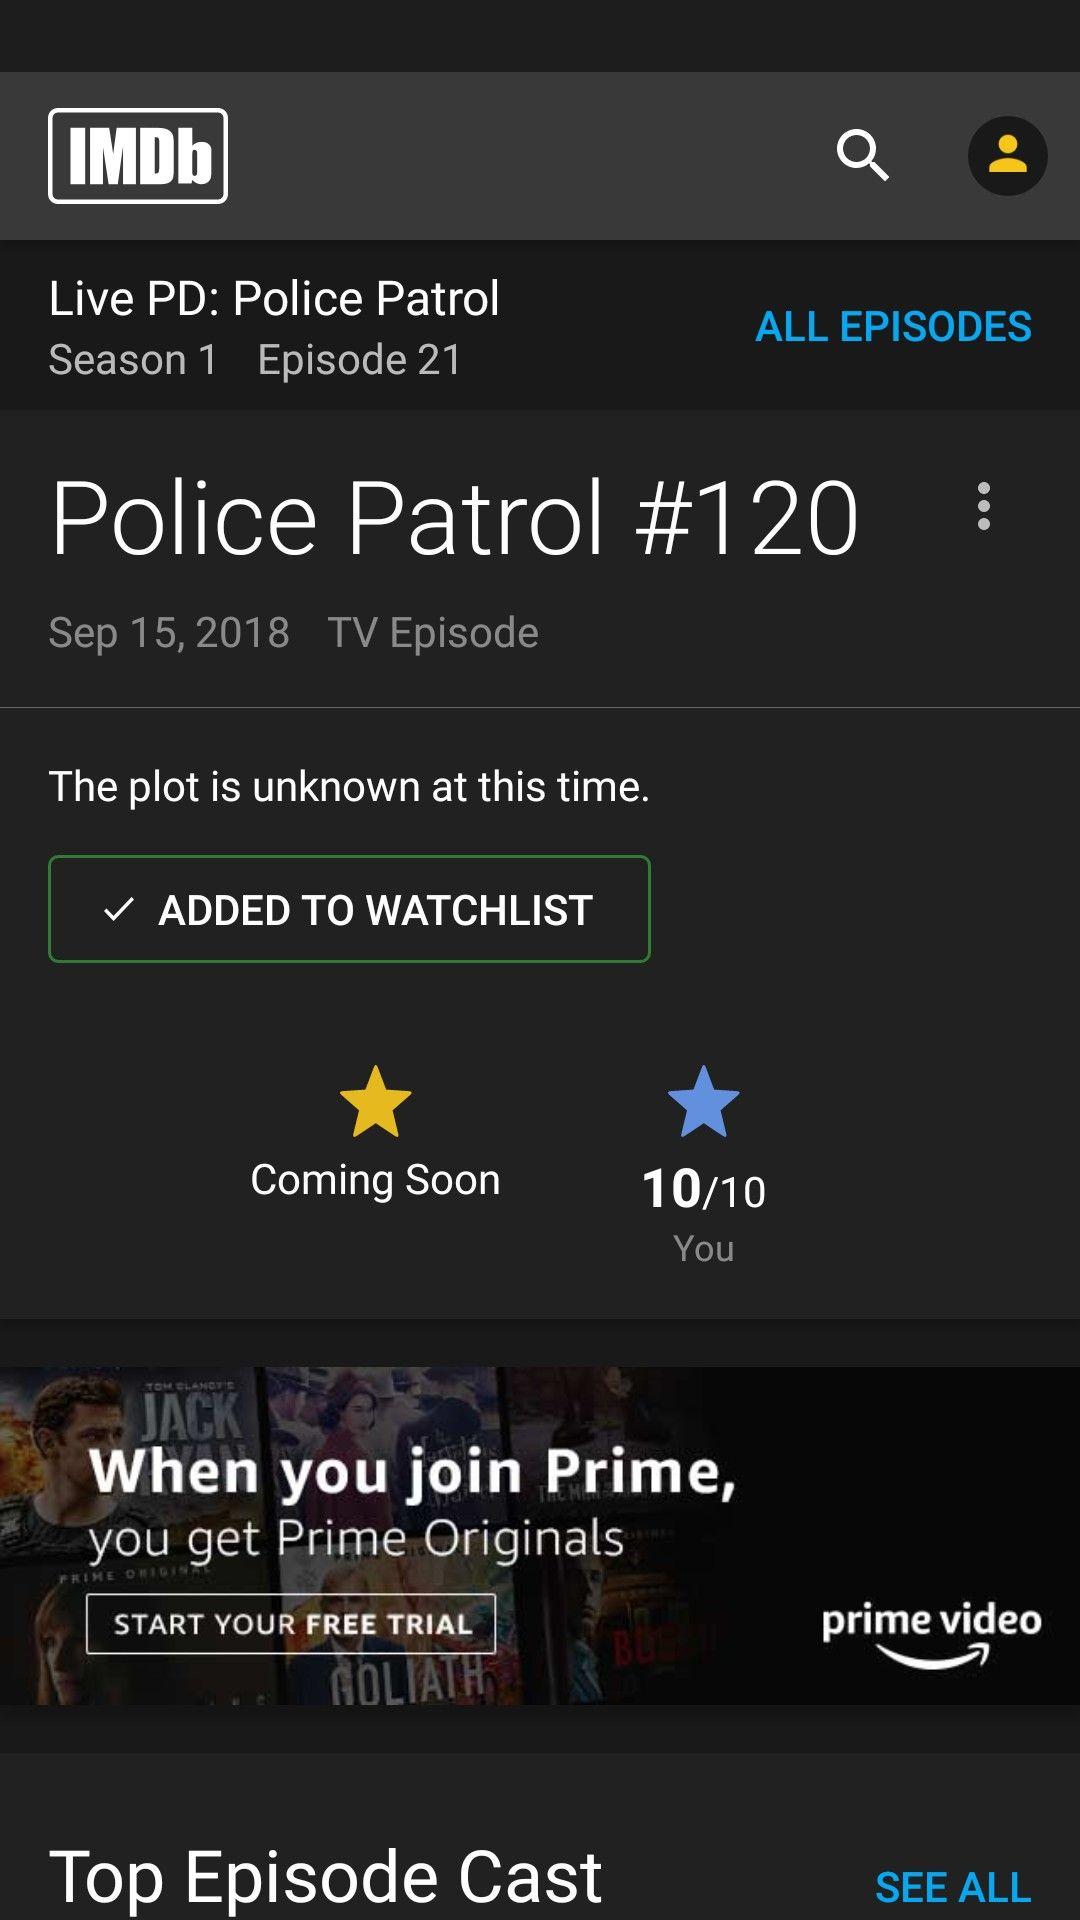 LIVE PD: S1/E21 PATROL#120 CHRIS MASTRIANNI, RICHLAND COUNTY SHERIFF